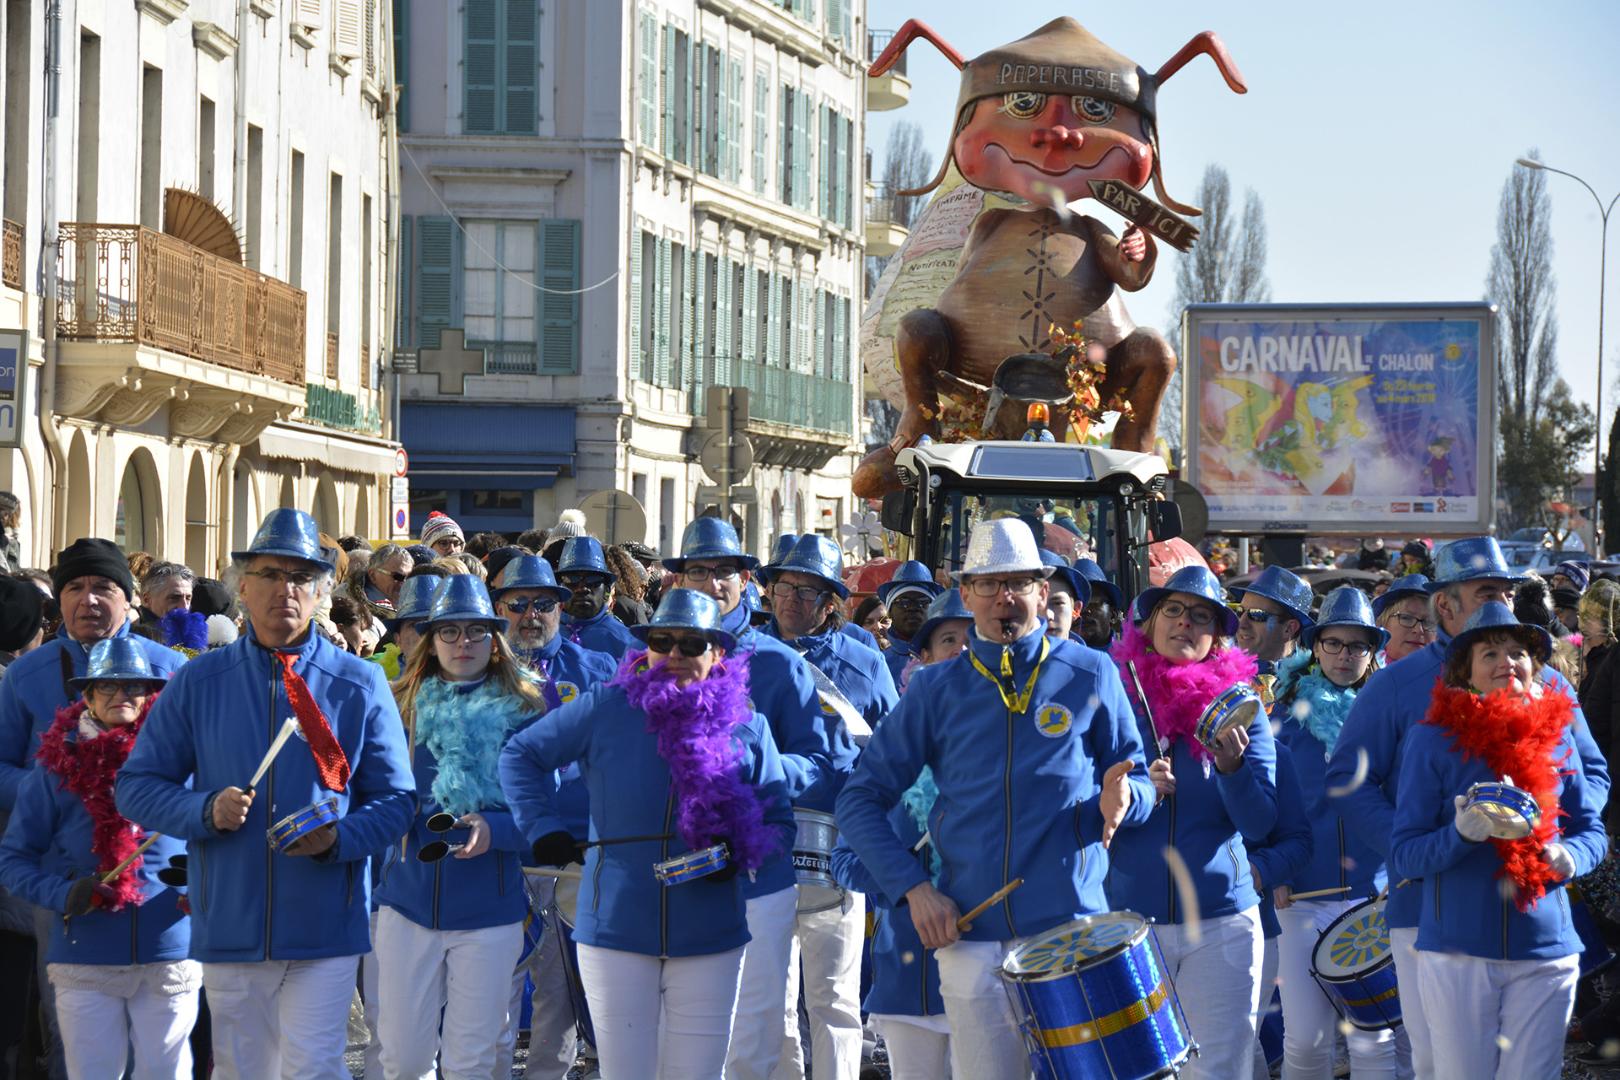 carnaval2019-12 (2021_02_07 10_18_26 UTC)